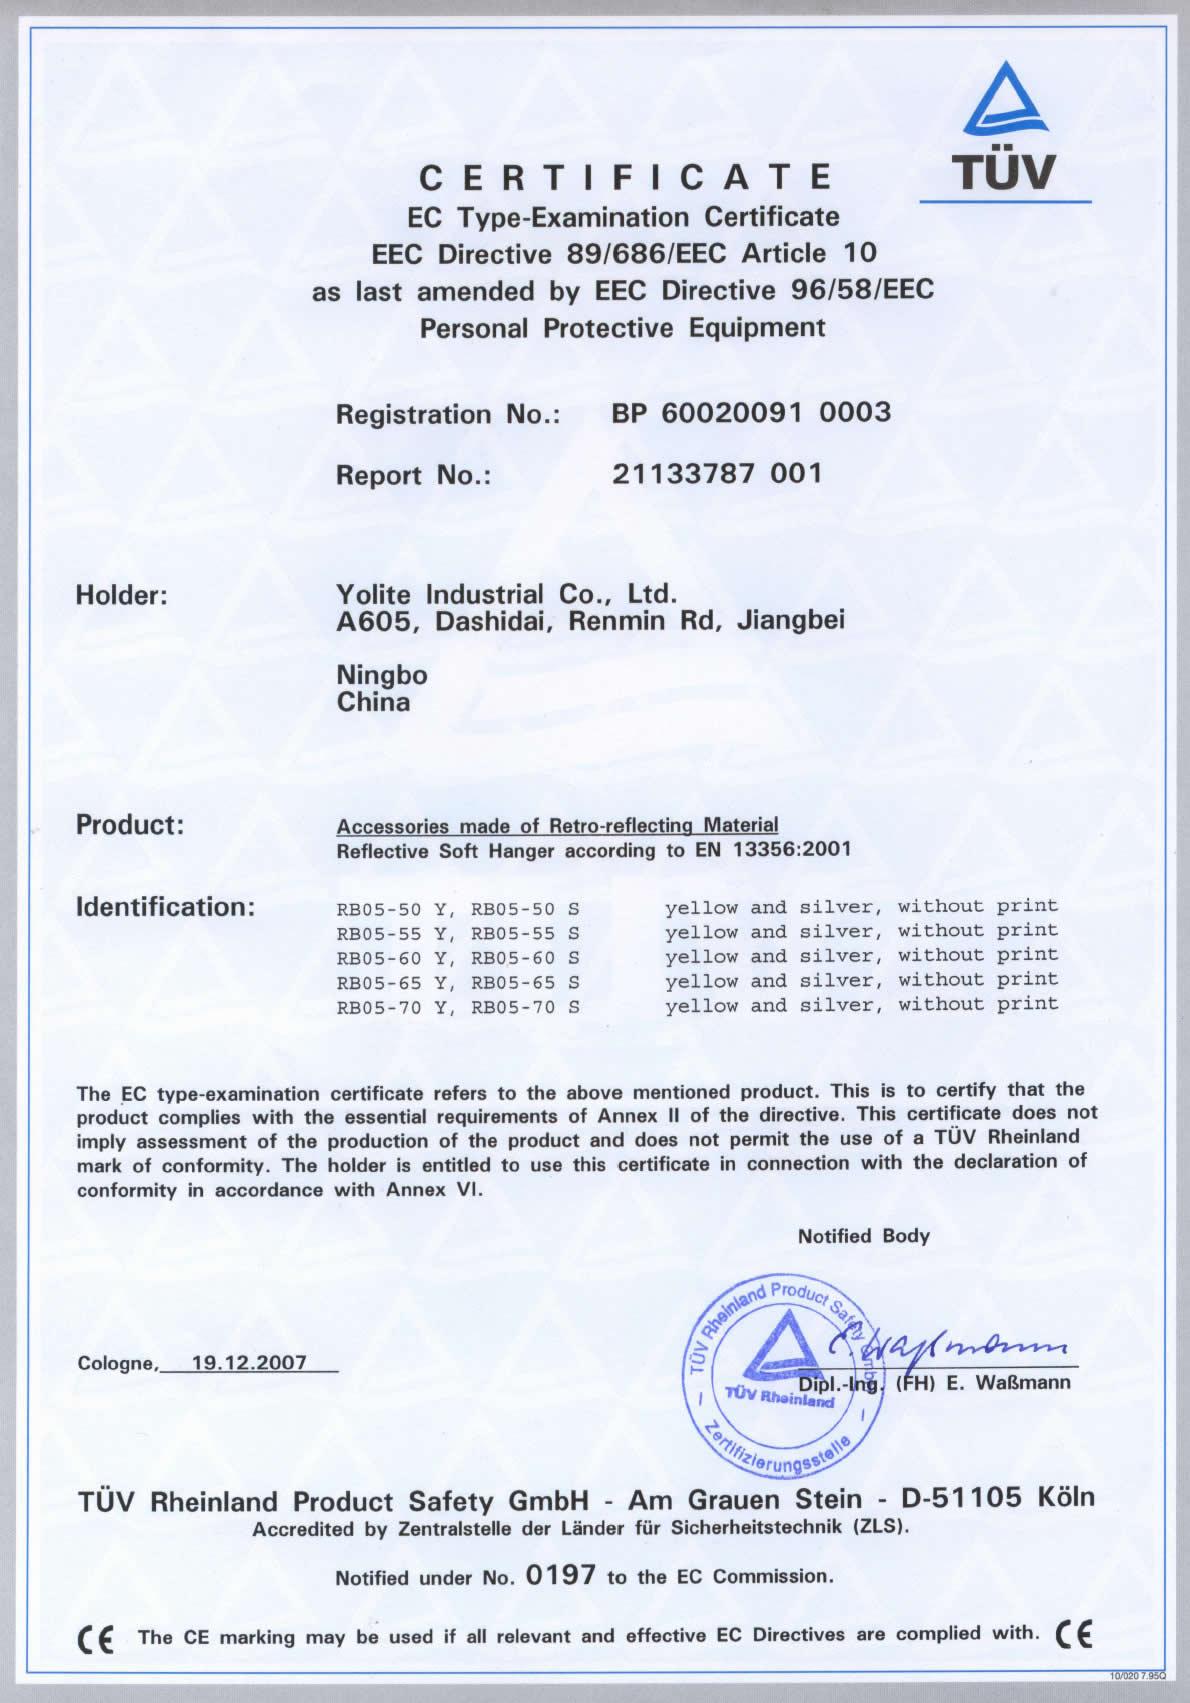 CE EN 13356 certificate for reflective hanger